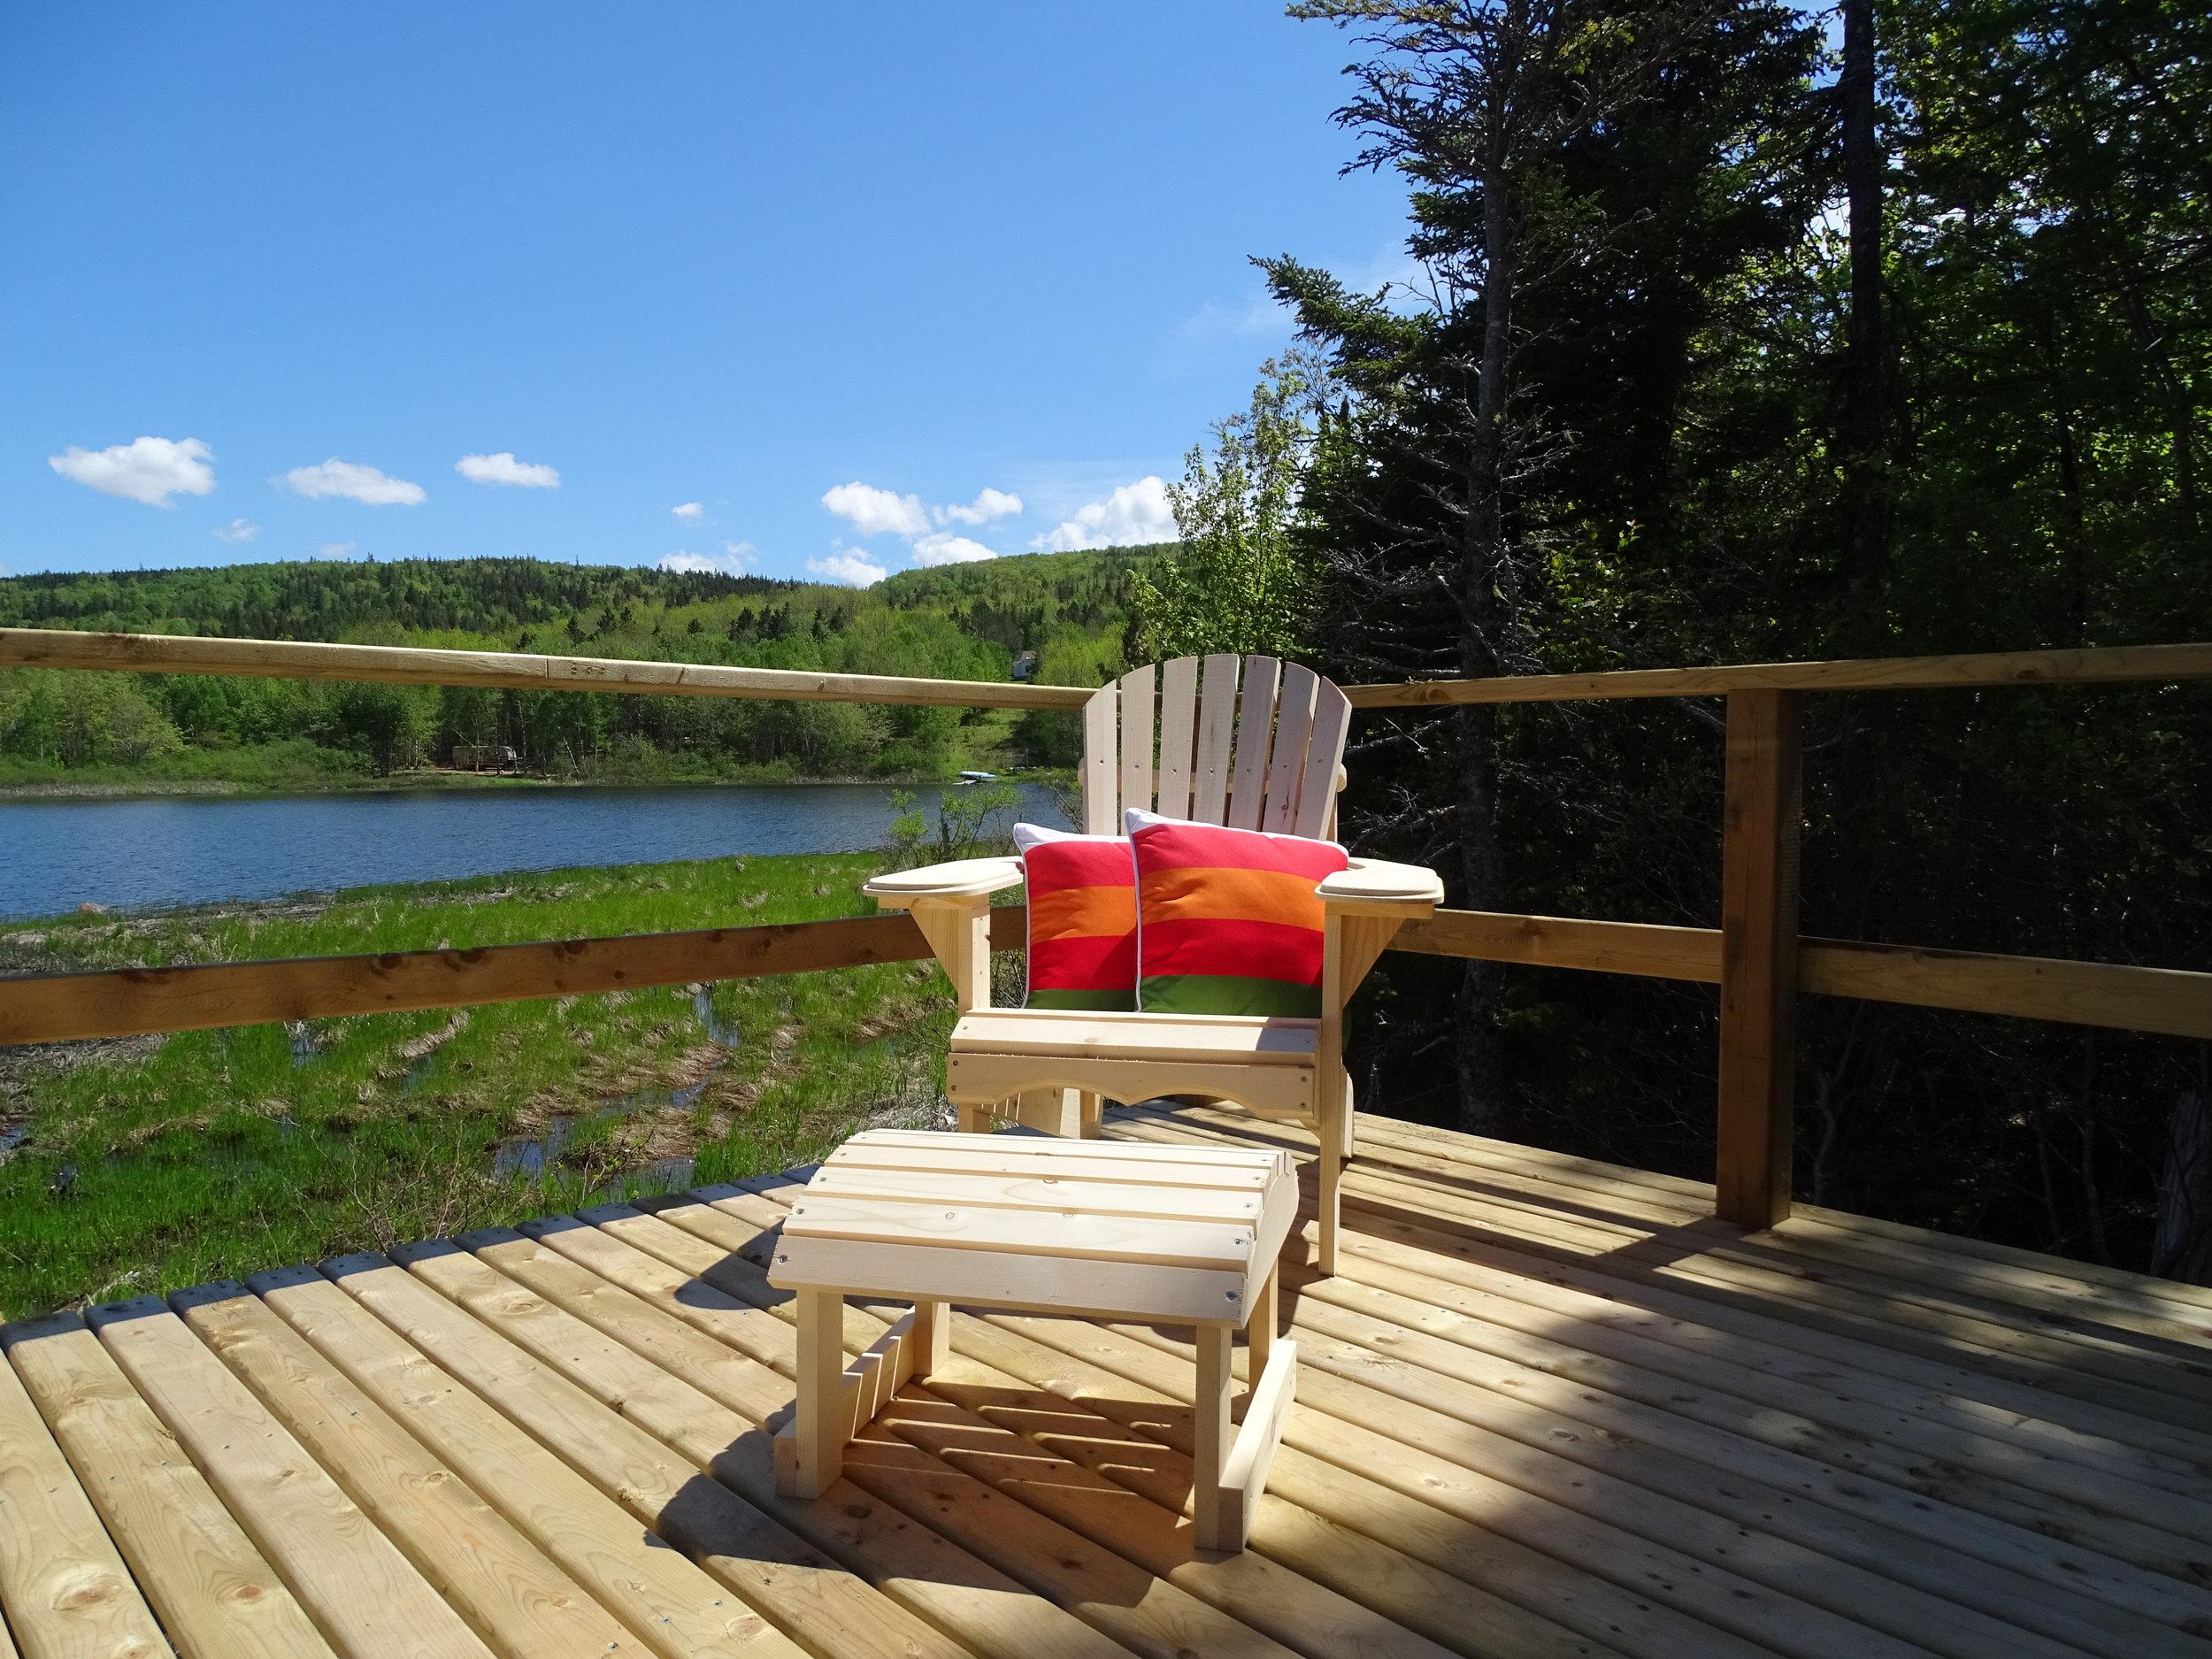 Muskoka chair and footstool? Check!